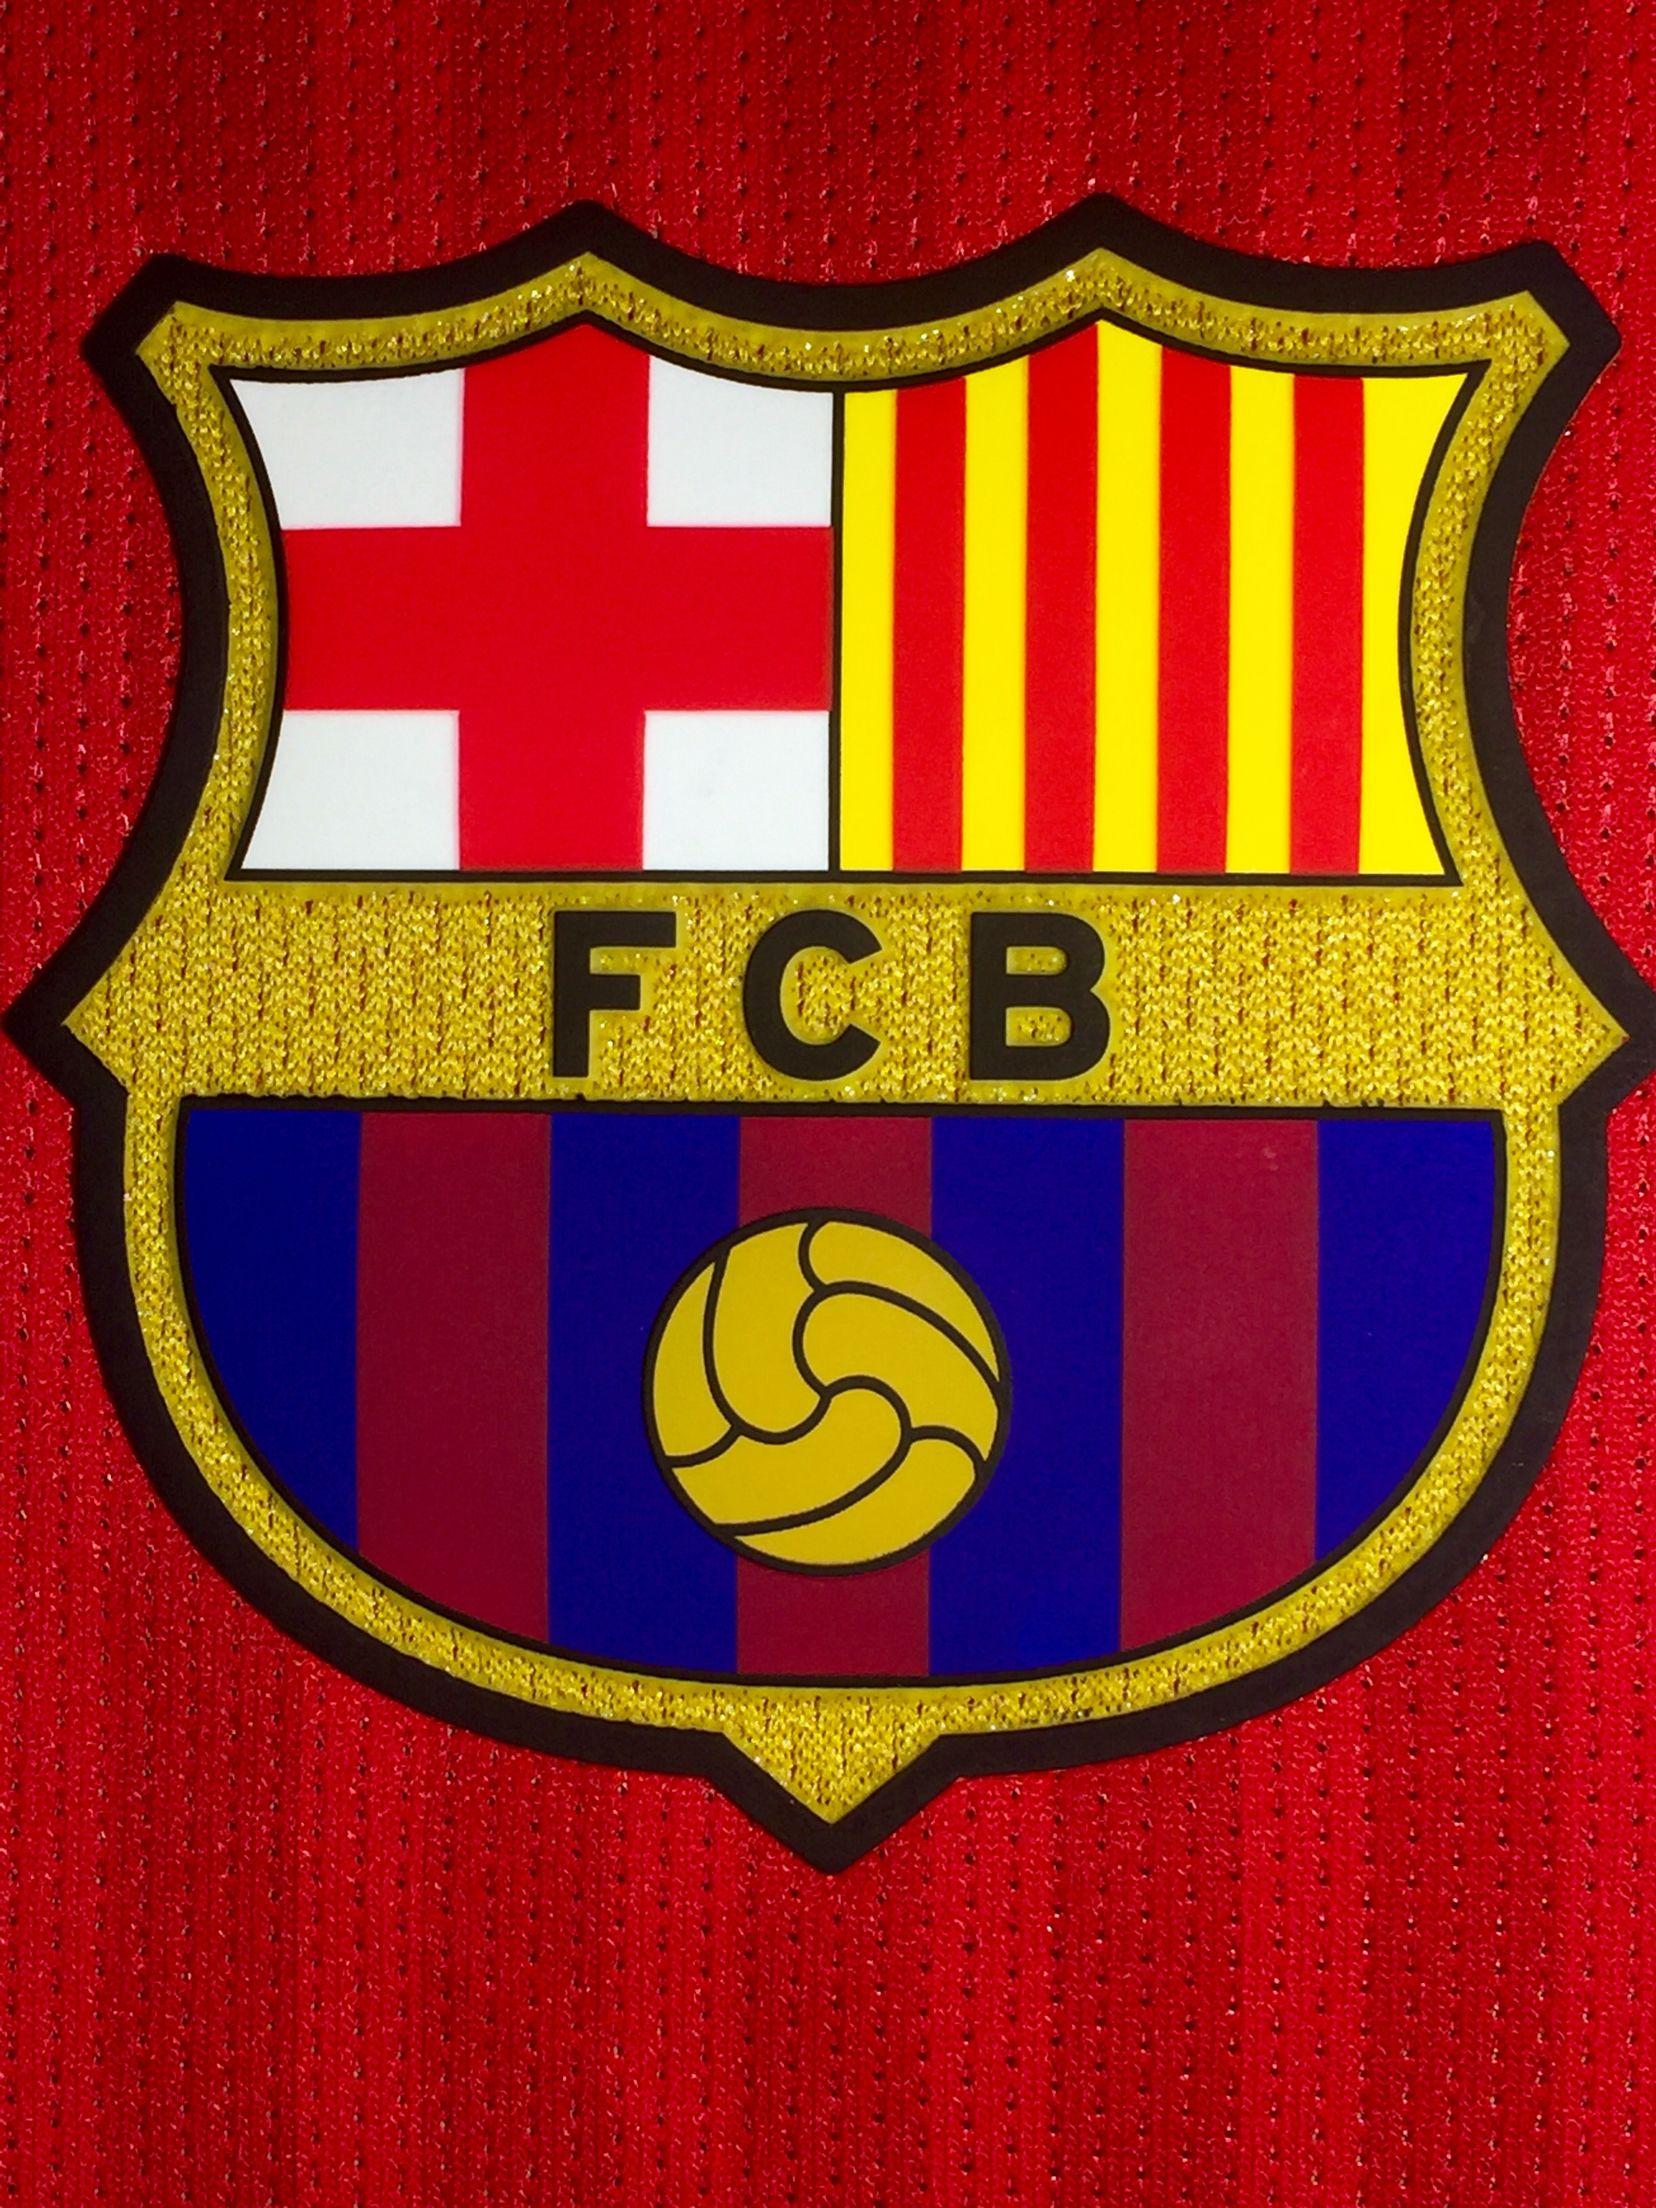 Escudo blaugrana temporada 2016 2017 bar a fc barcelone barcelone et football - Logo barcelone foot ...